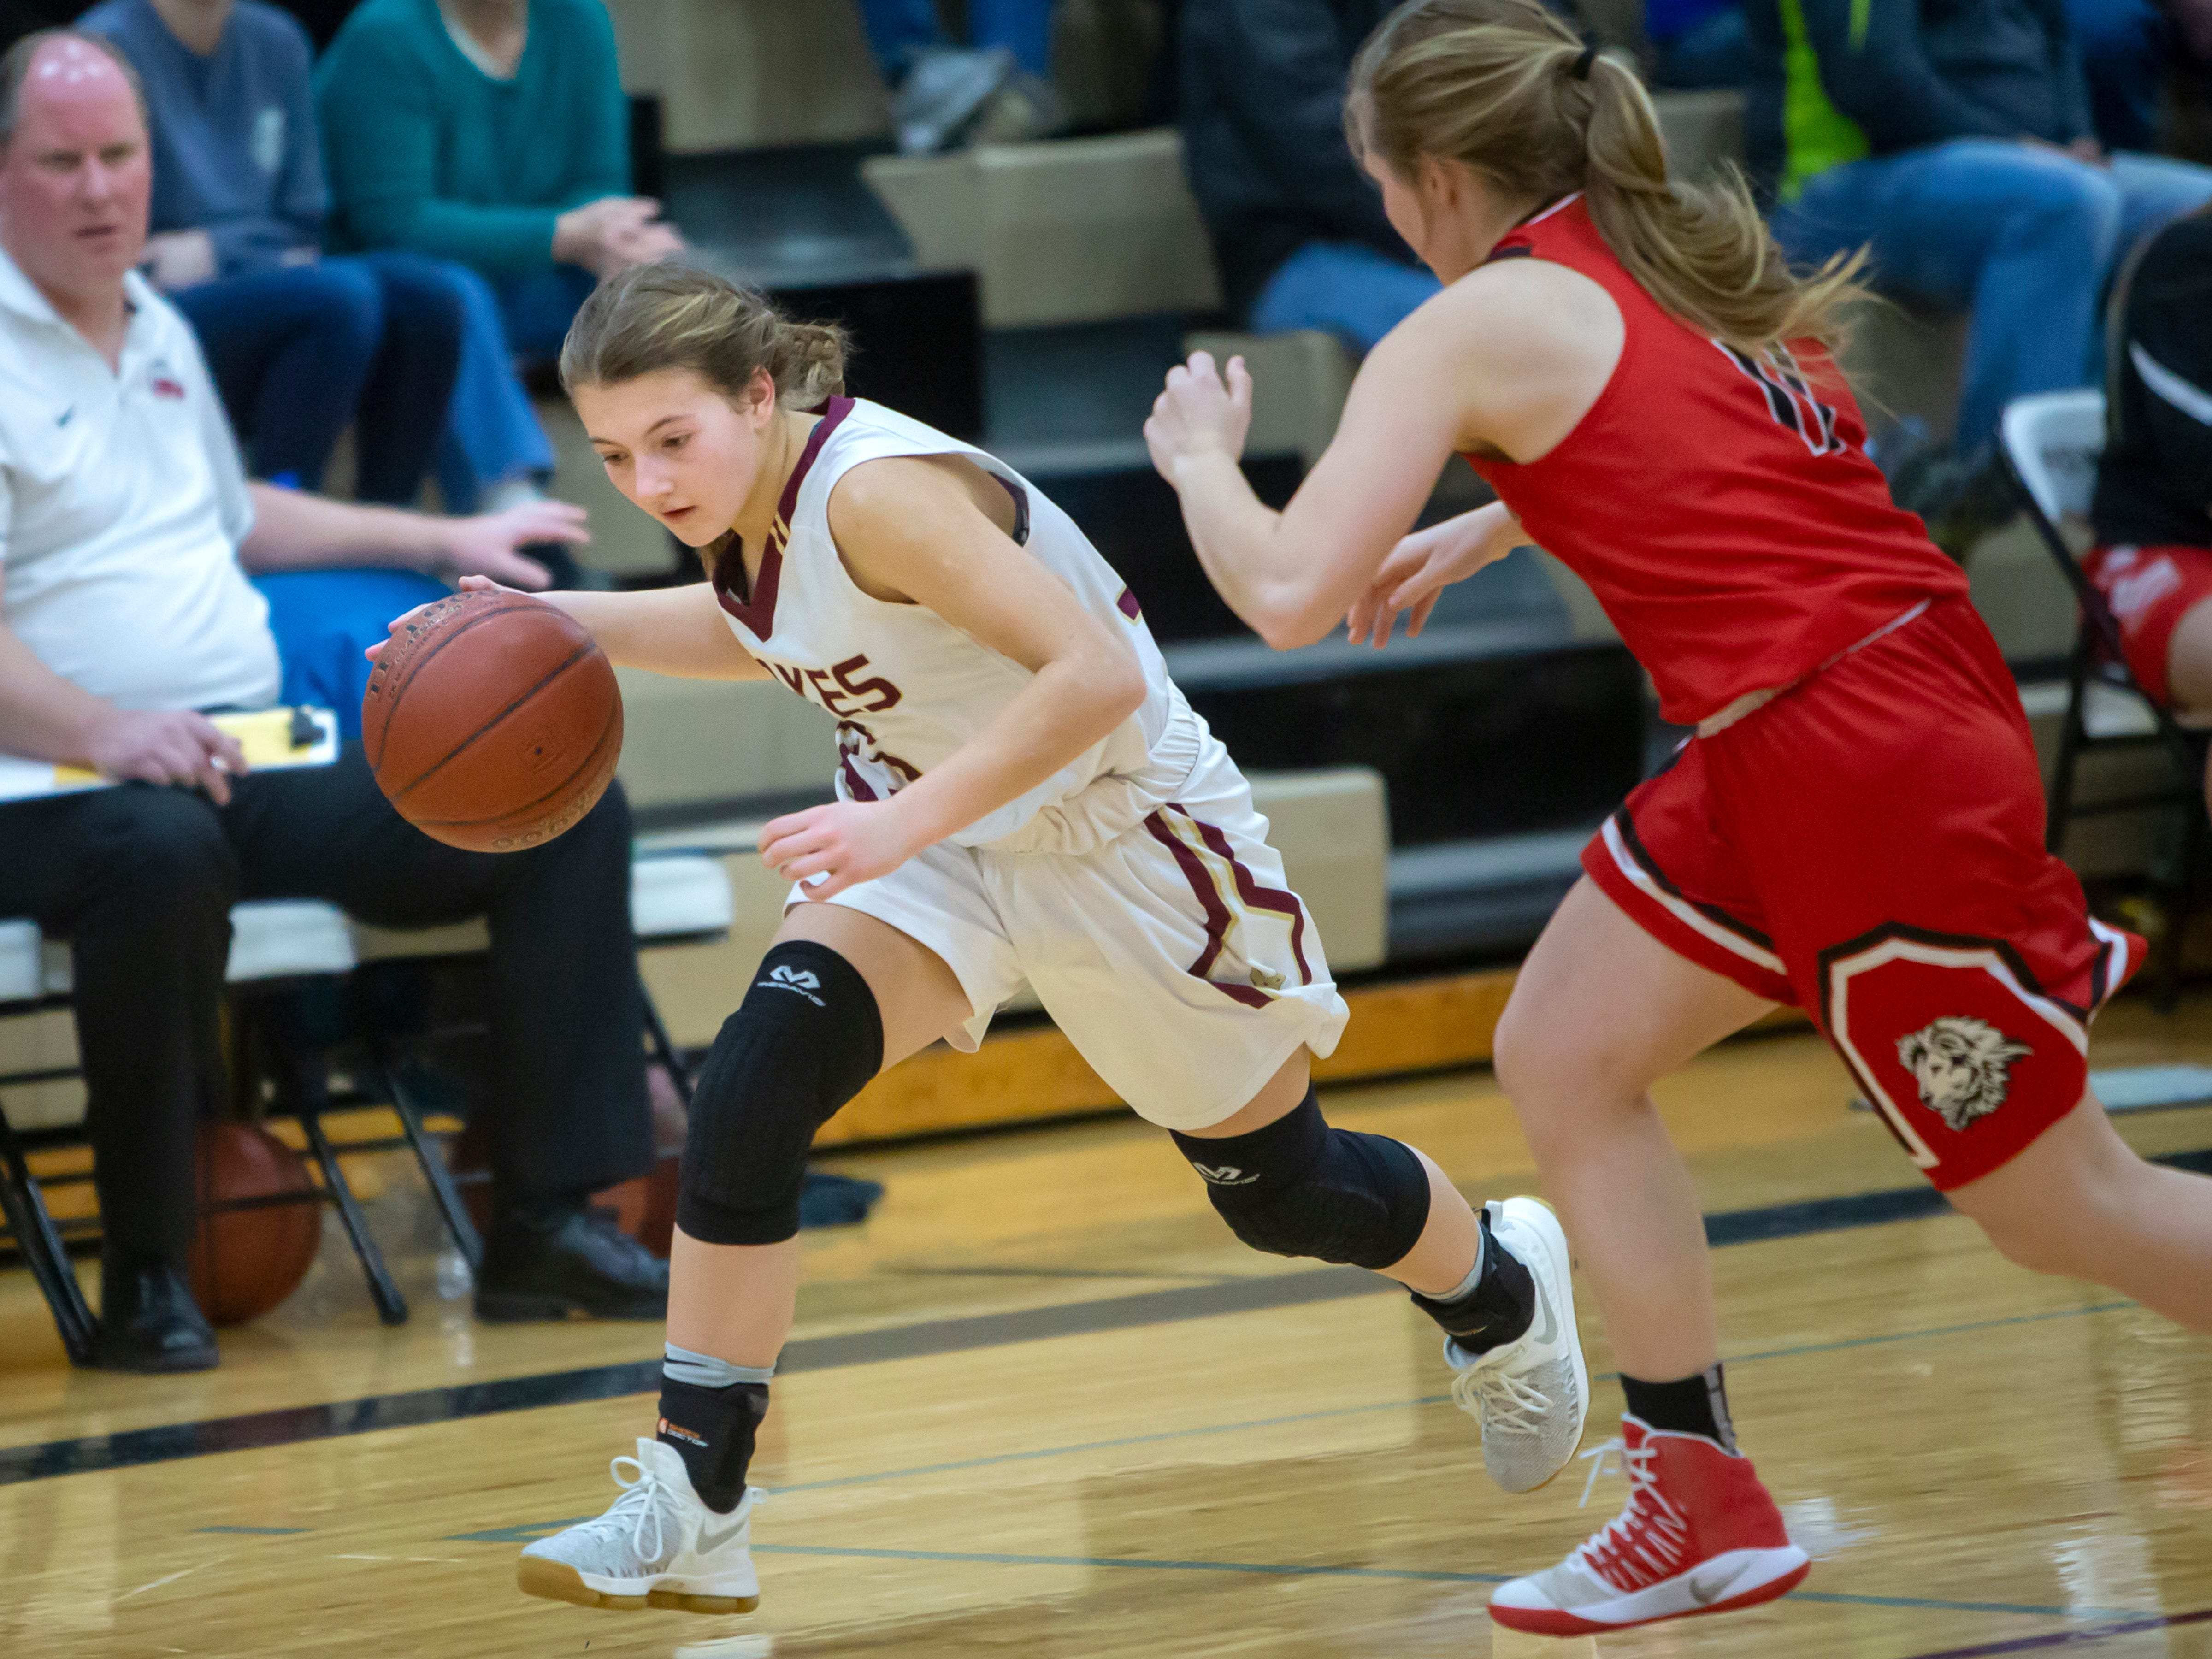 Omro's Hannah Fedderly runs the ball past Lomira's Samantha Doyle at Omro High School on Friday, December 14, 2018.